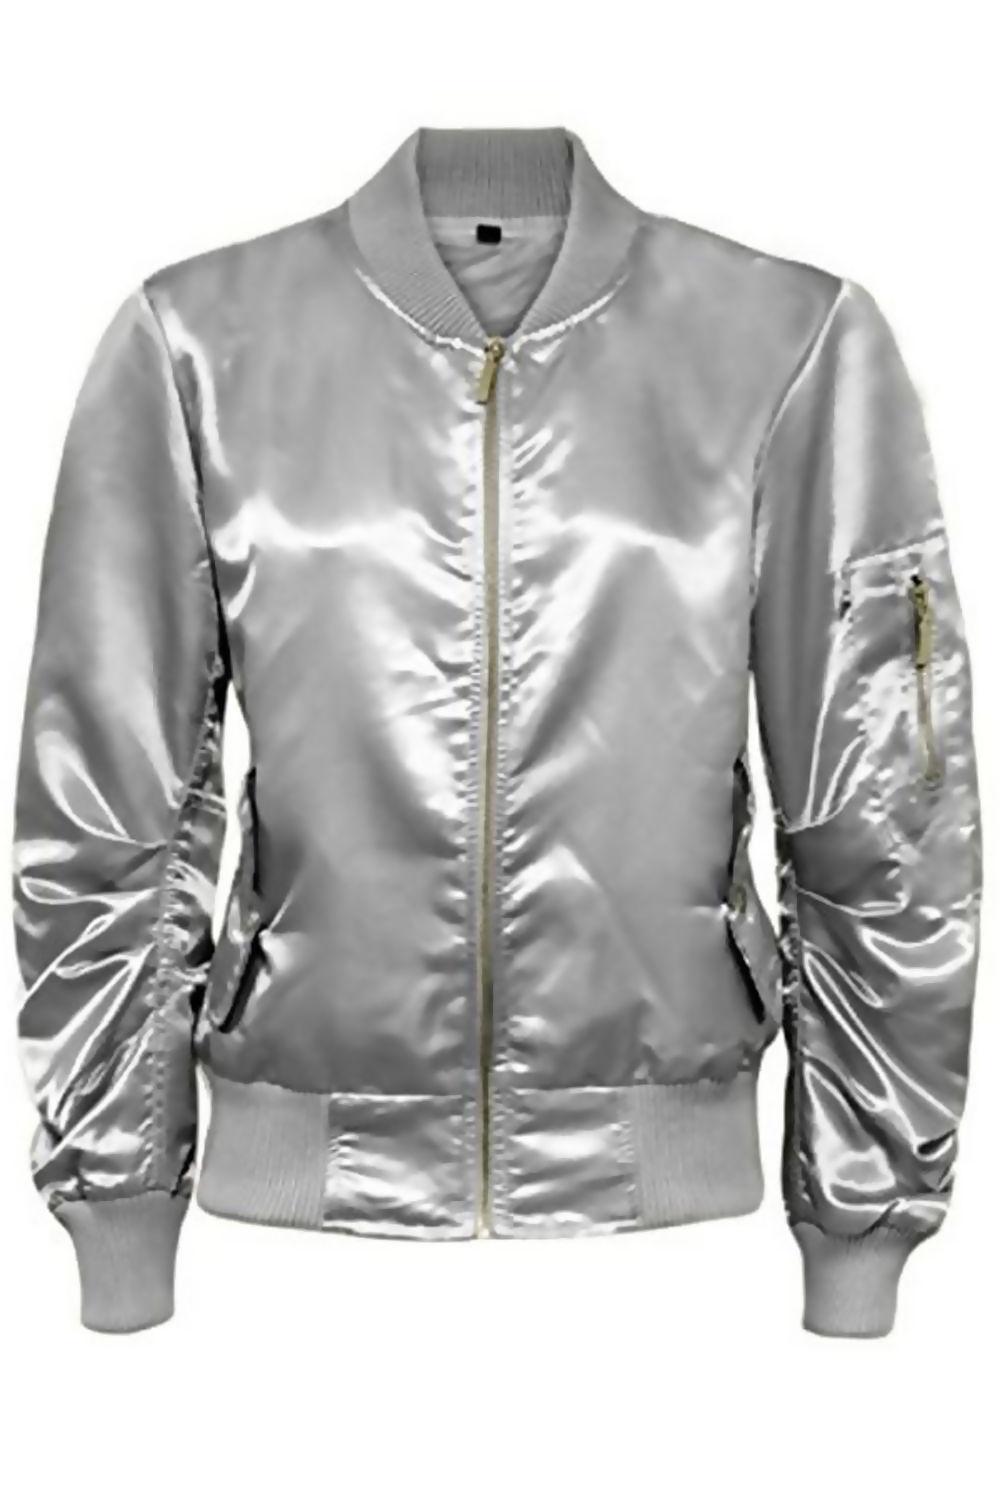 Silver Satin Ma1 Bomber Jacket Bomber Jacket Jackets Long Jeans [ 1496 x 1000 Pixel ]